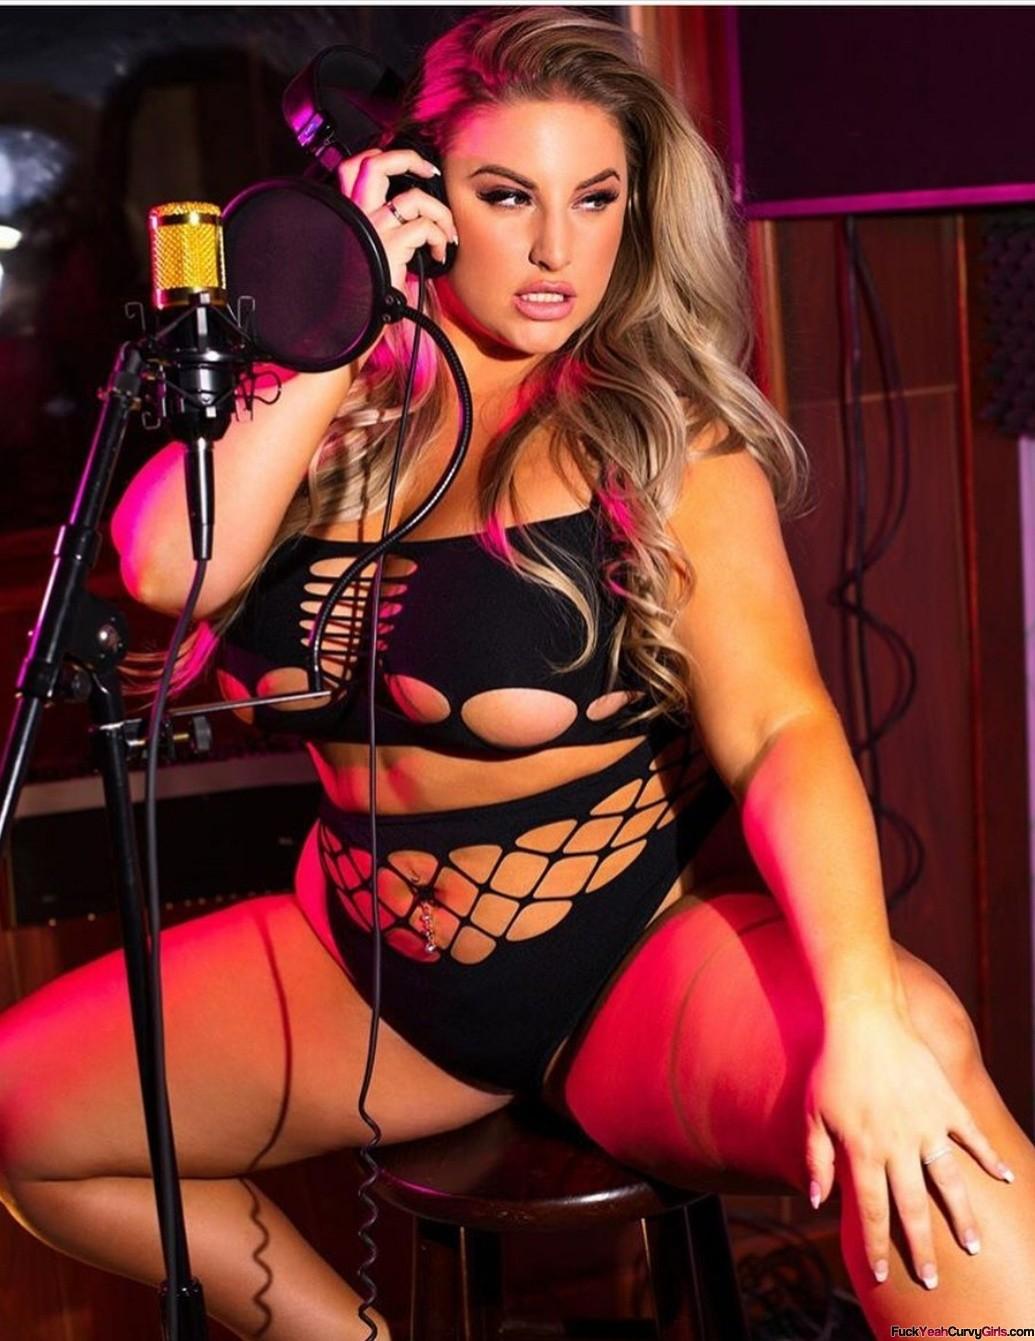 thick-model-Ashley-Alexiss